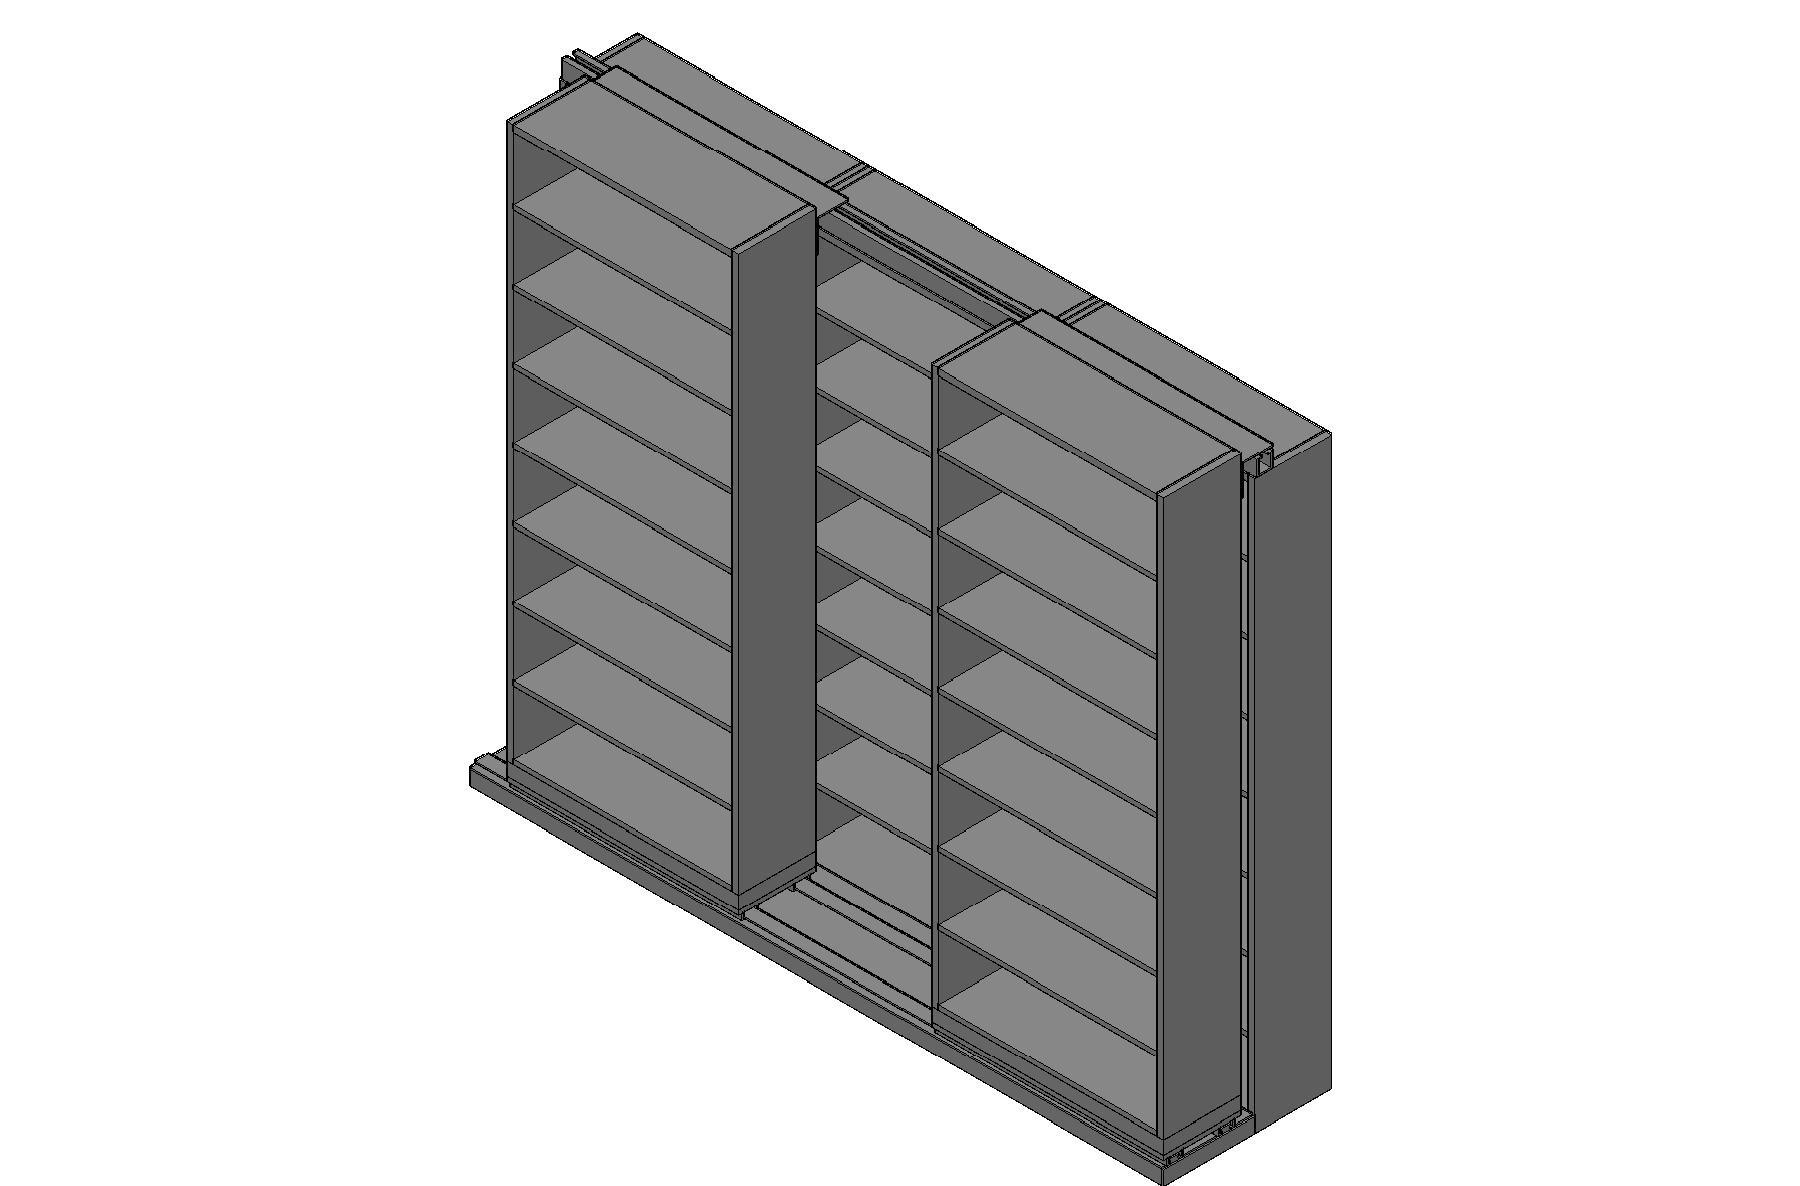 "Letter Size Sliding Shelves - 2 Rows Deep - 8 Levels - (36"" x 12"" Shelves) - 112"" Total Width"